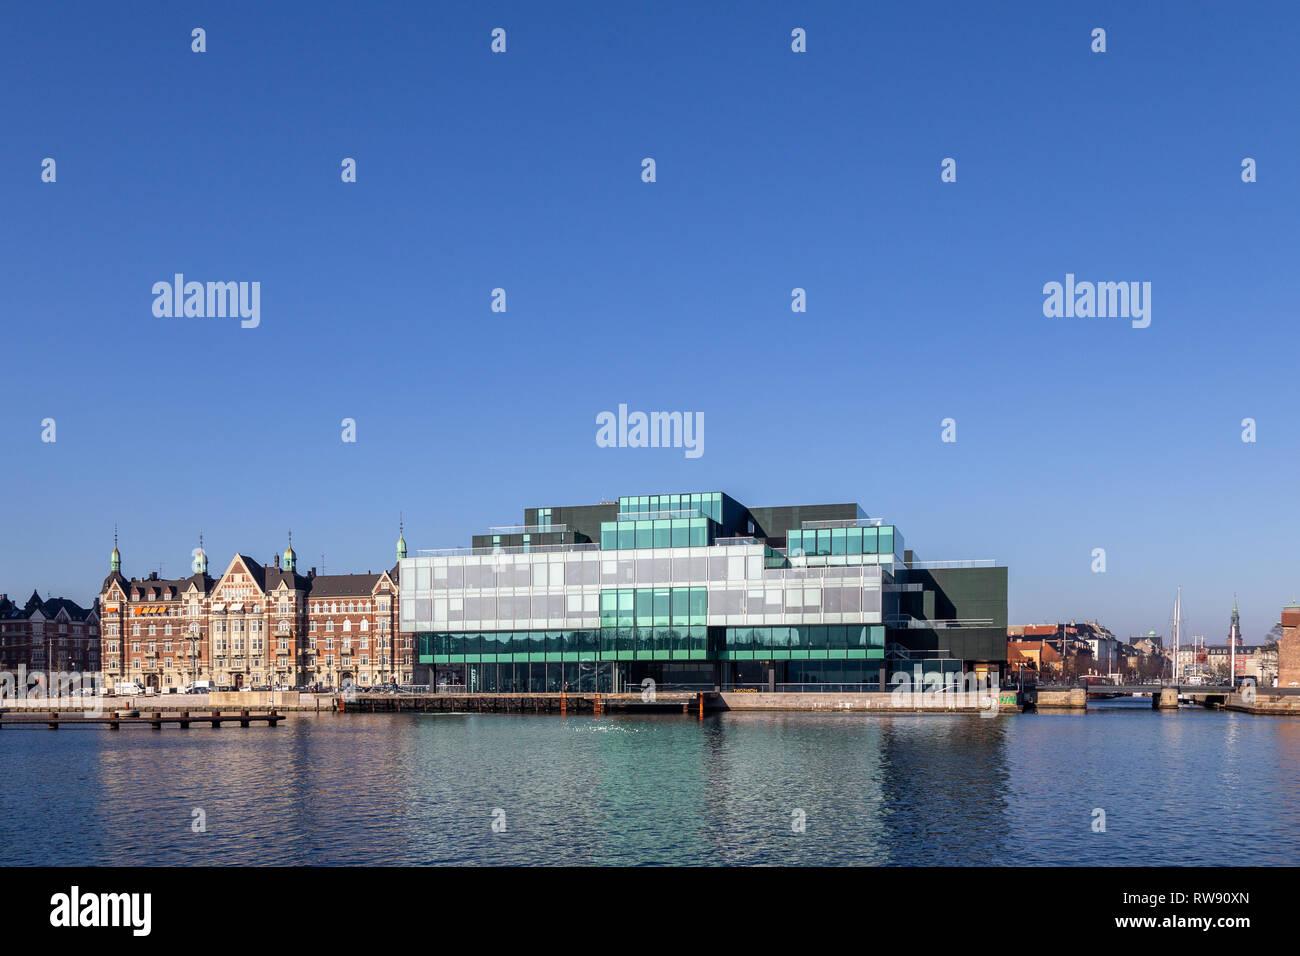 Danish Architecture Center DAC in Copenhagen, Denmark - Stock Image